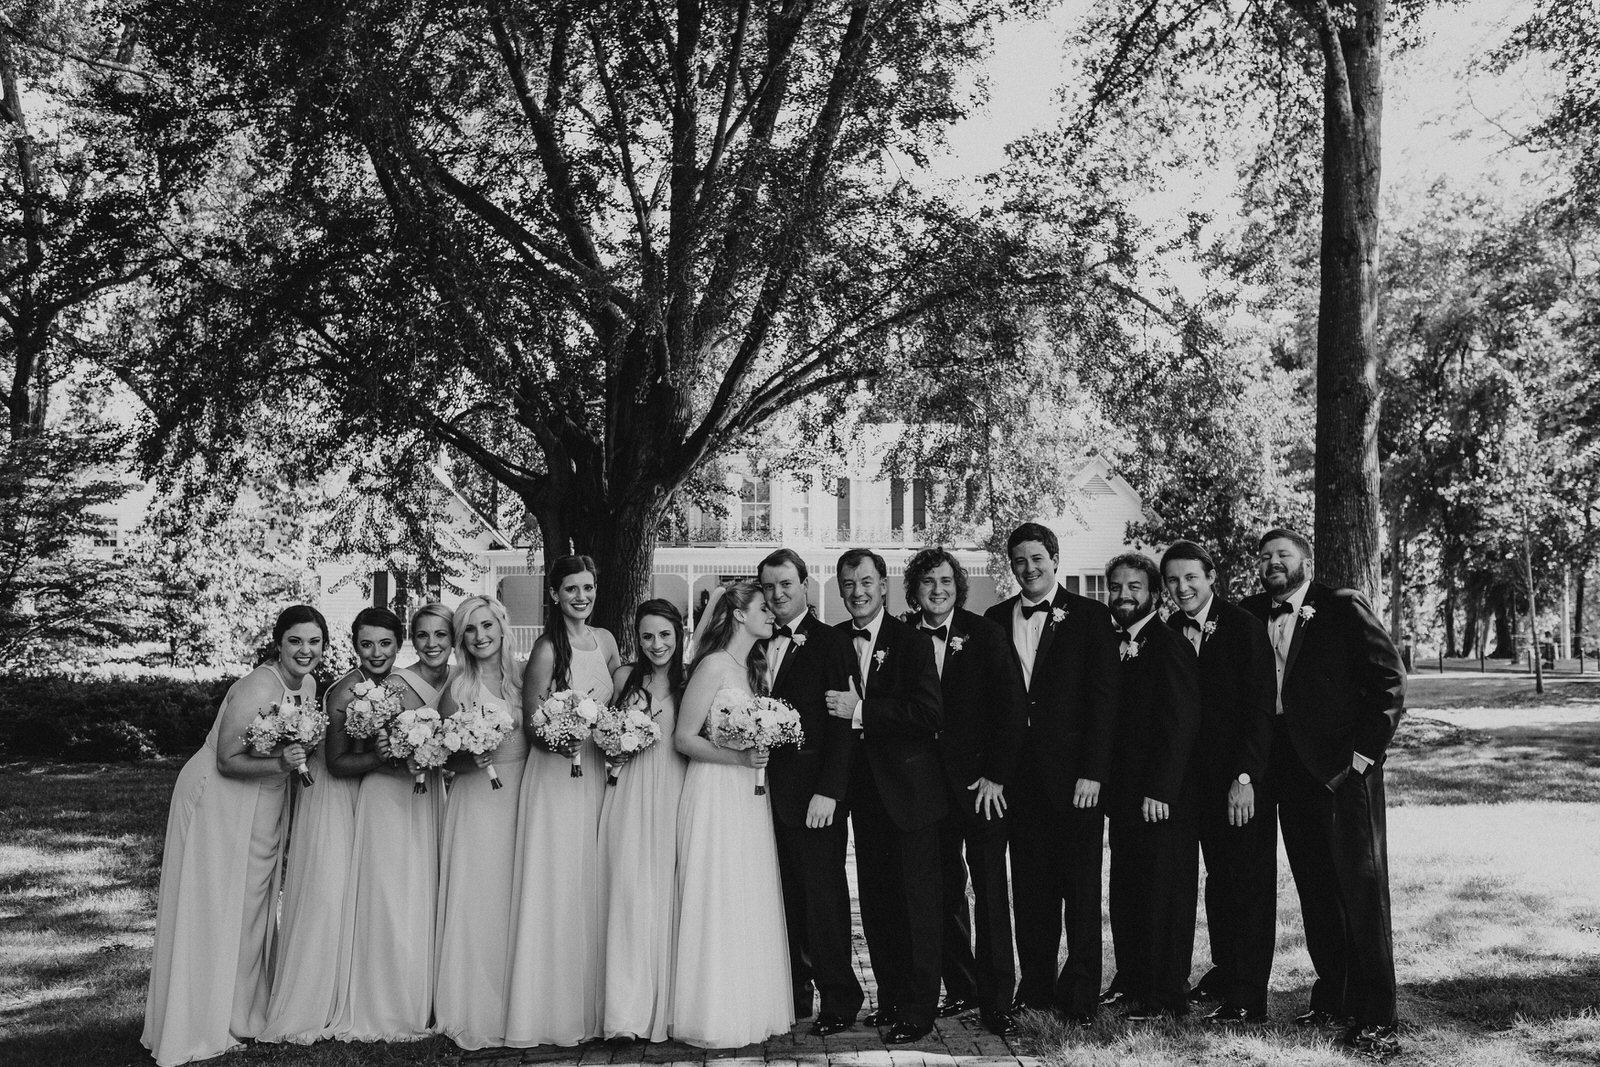 Oxford_Mississippi_wedding_photographer_27.JPG